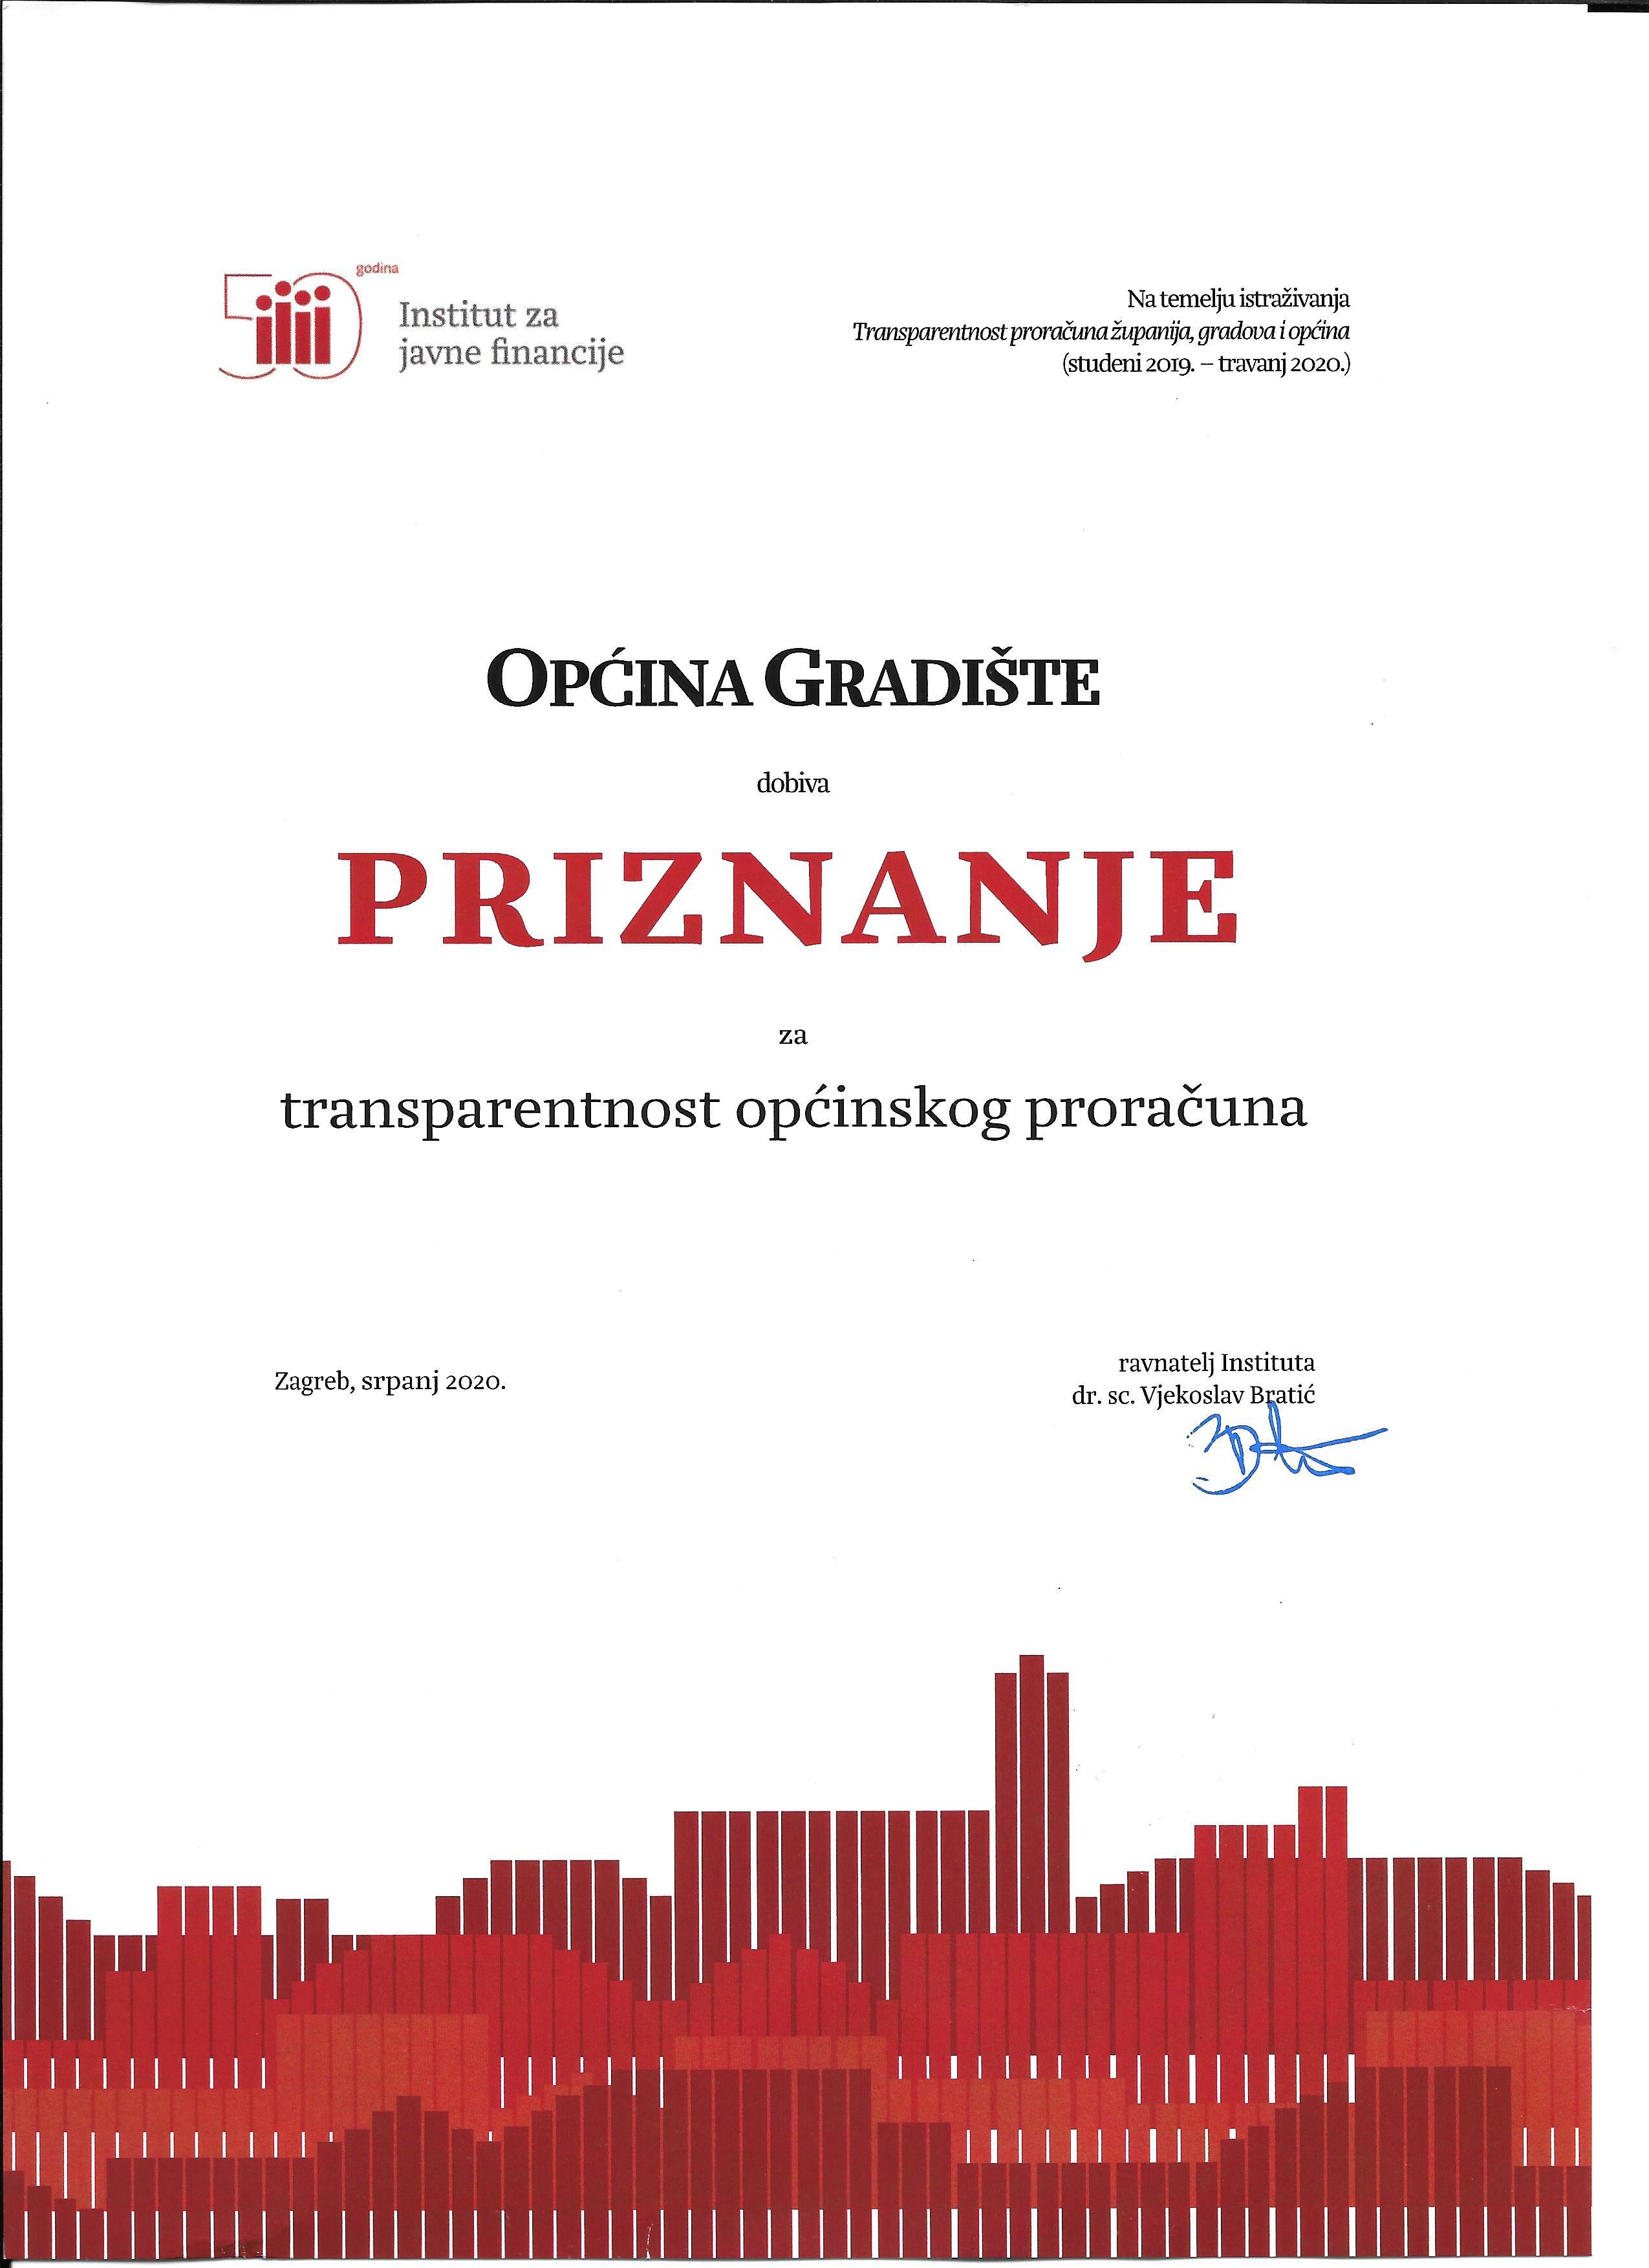 Općina Gradište dobila priznanje Instituta za javne financije za transparentnost